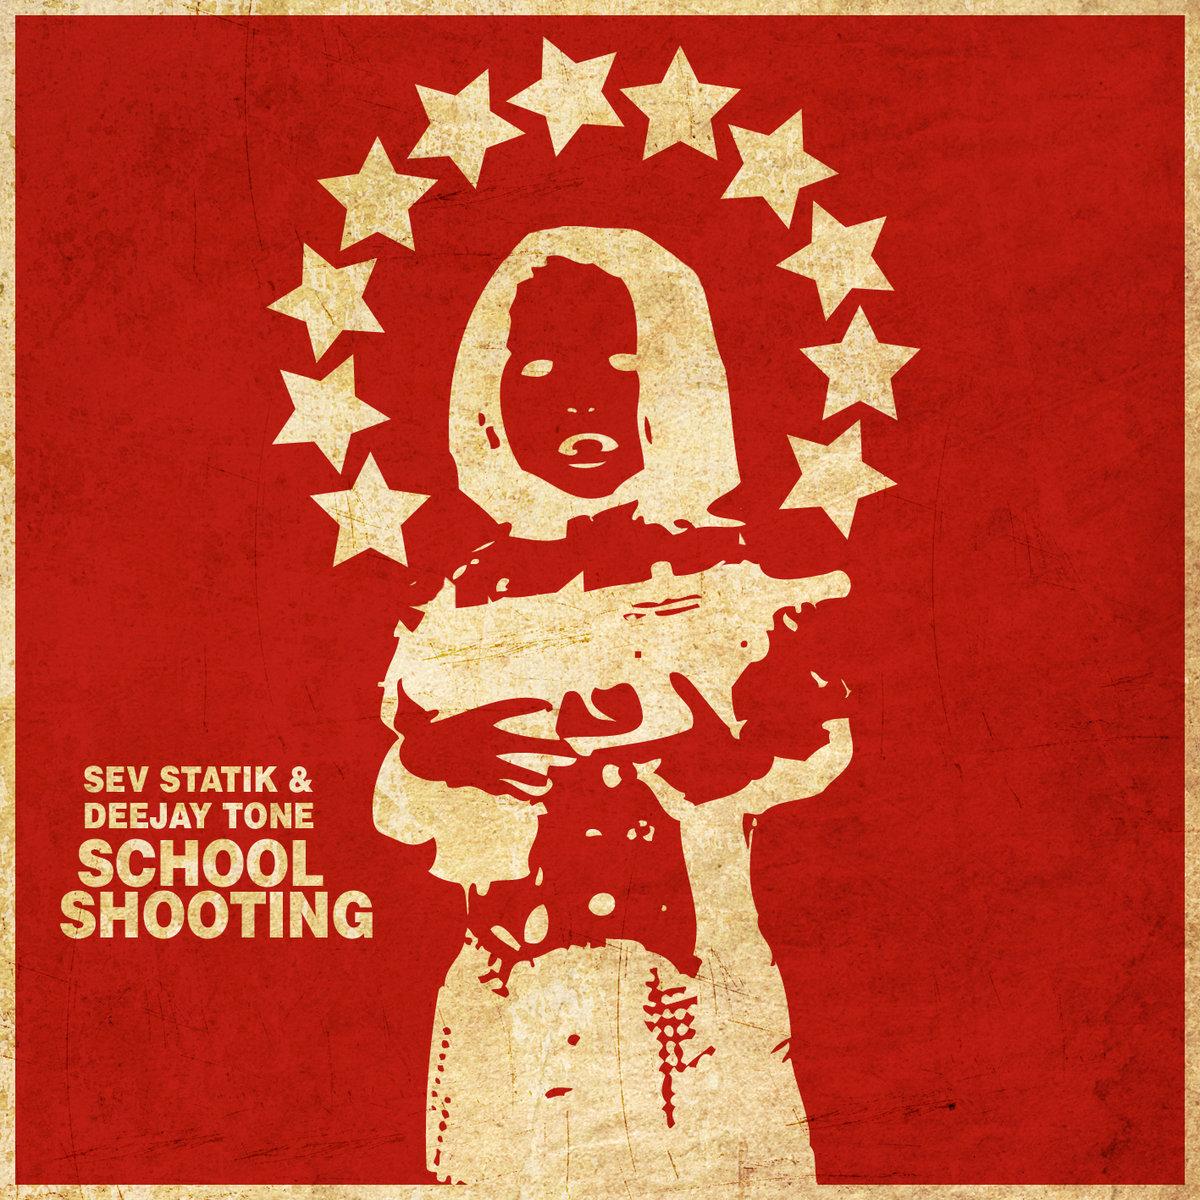 School Shooting Song: School Shooting EP